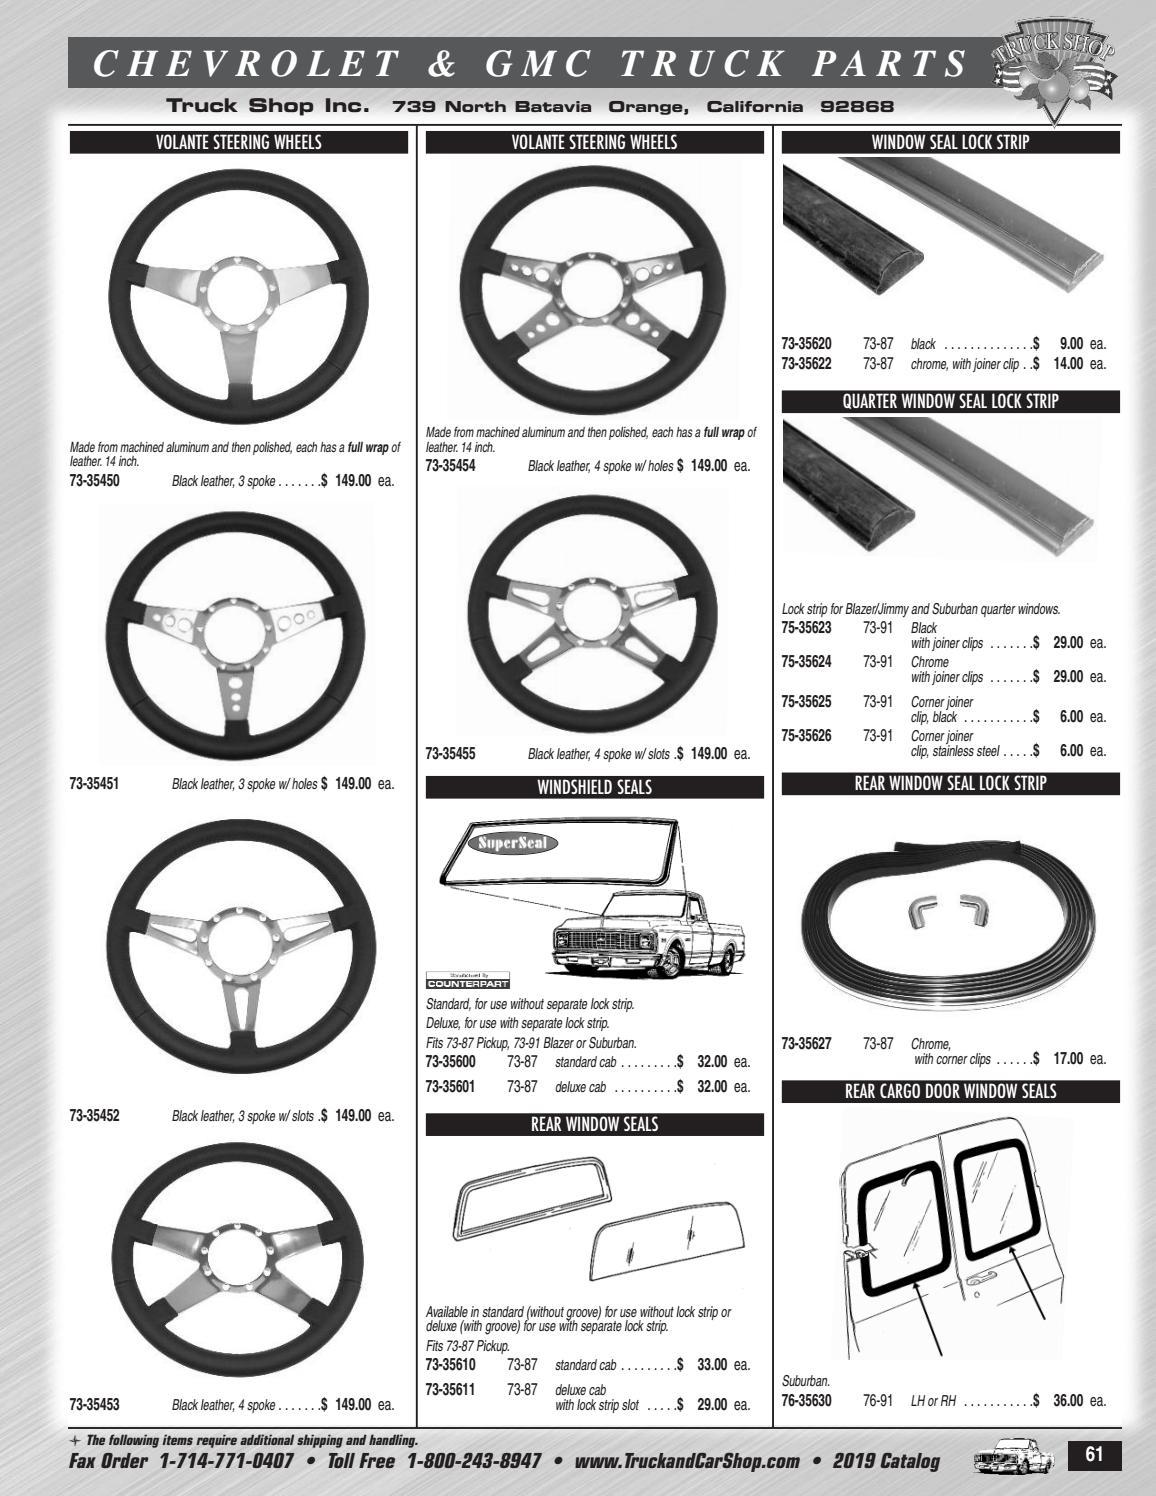 1973-1987 Chevrolet /& GMC Pickups with Slot for Lockstrip Rear Windshield Gasket